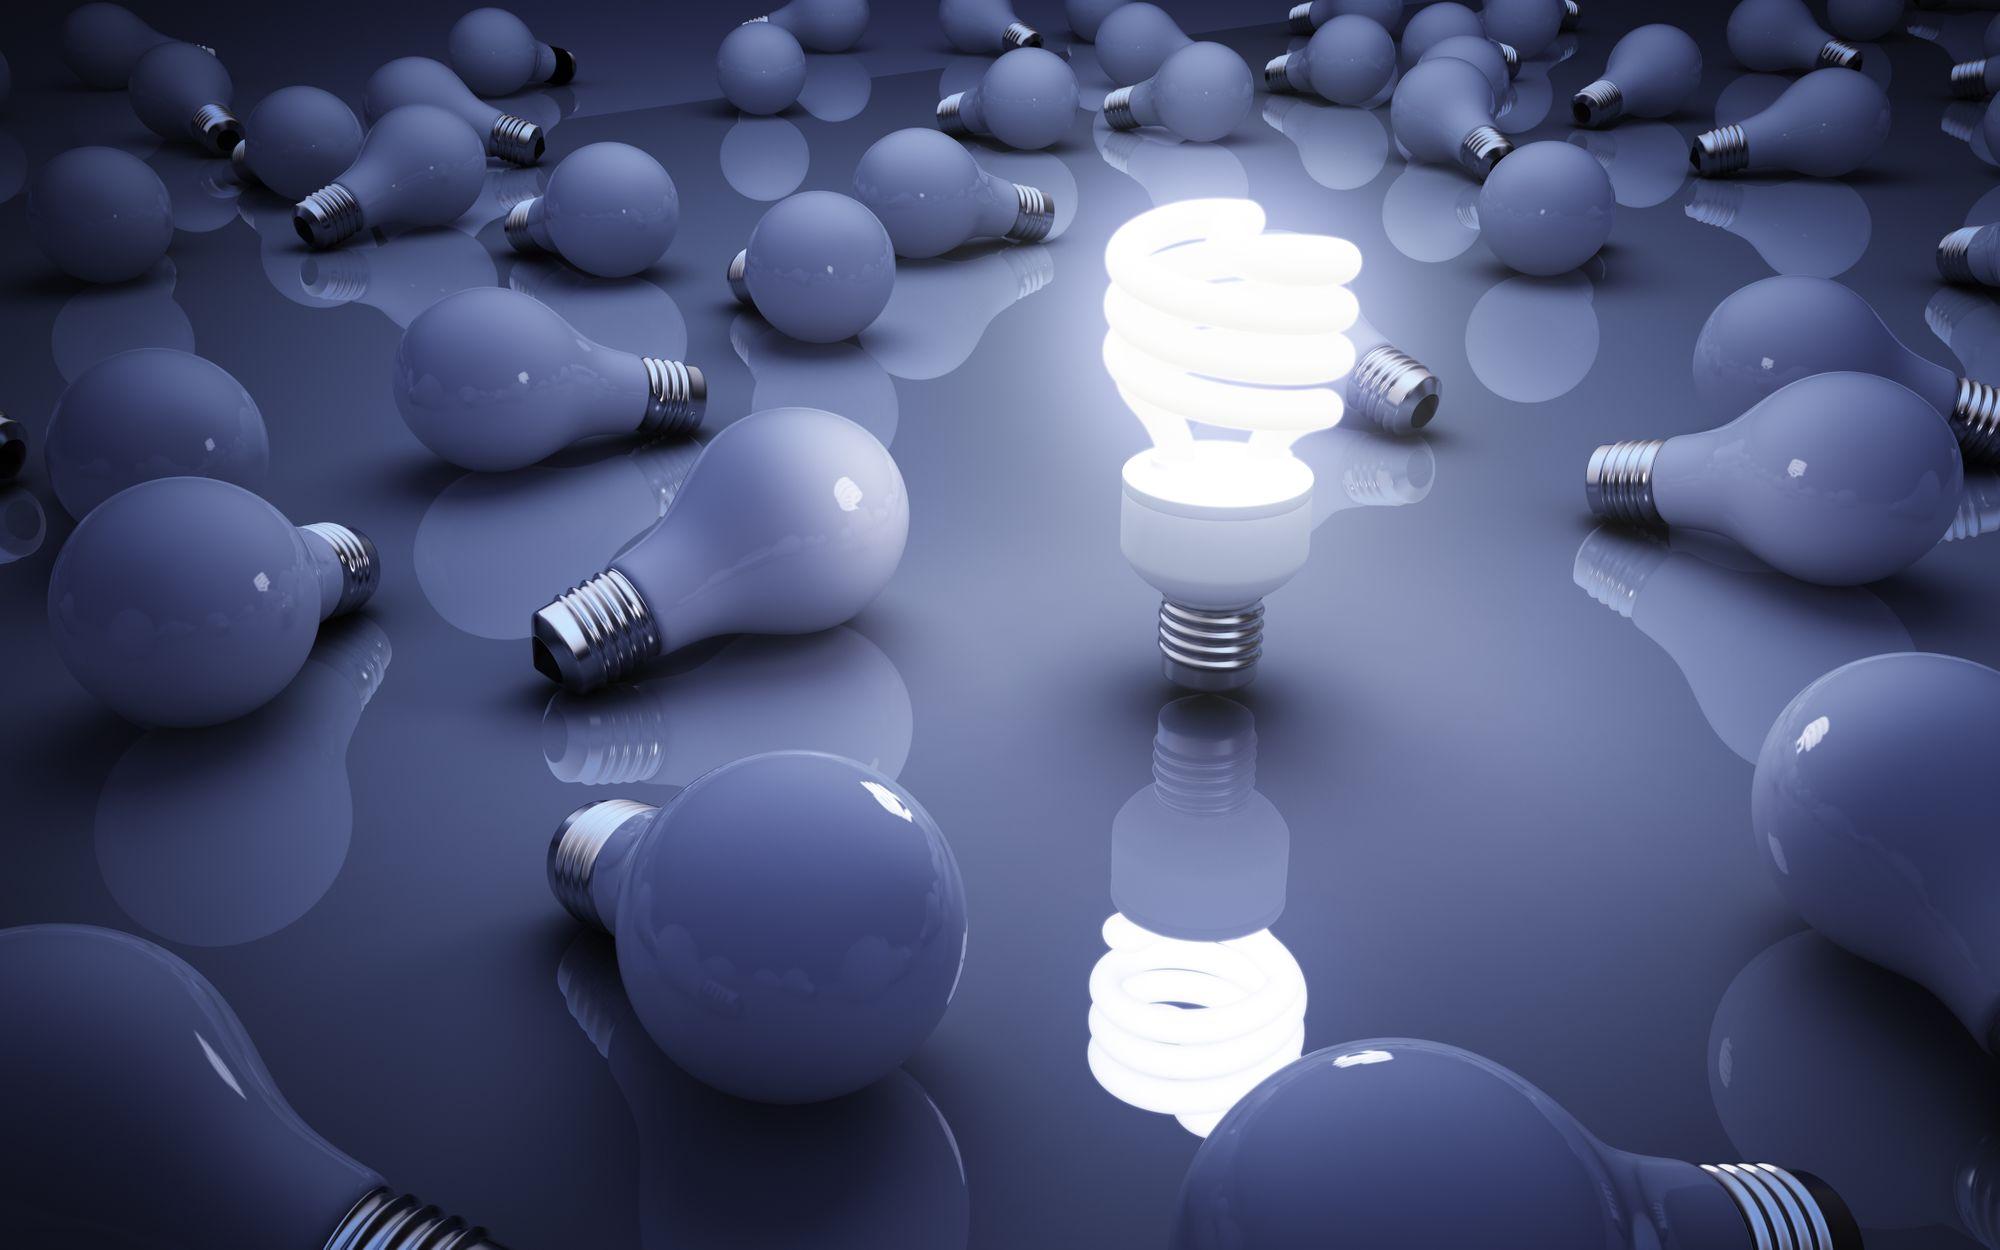 Market & Forecast of Global LED Lighting